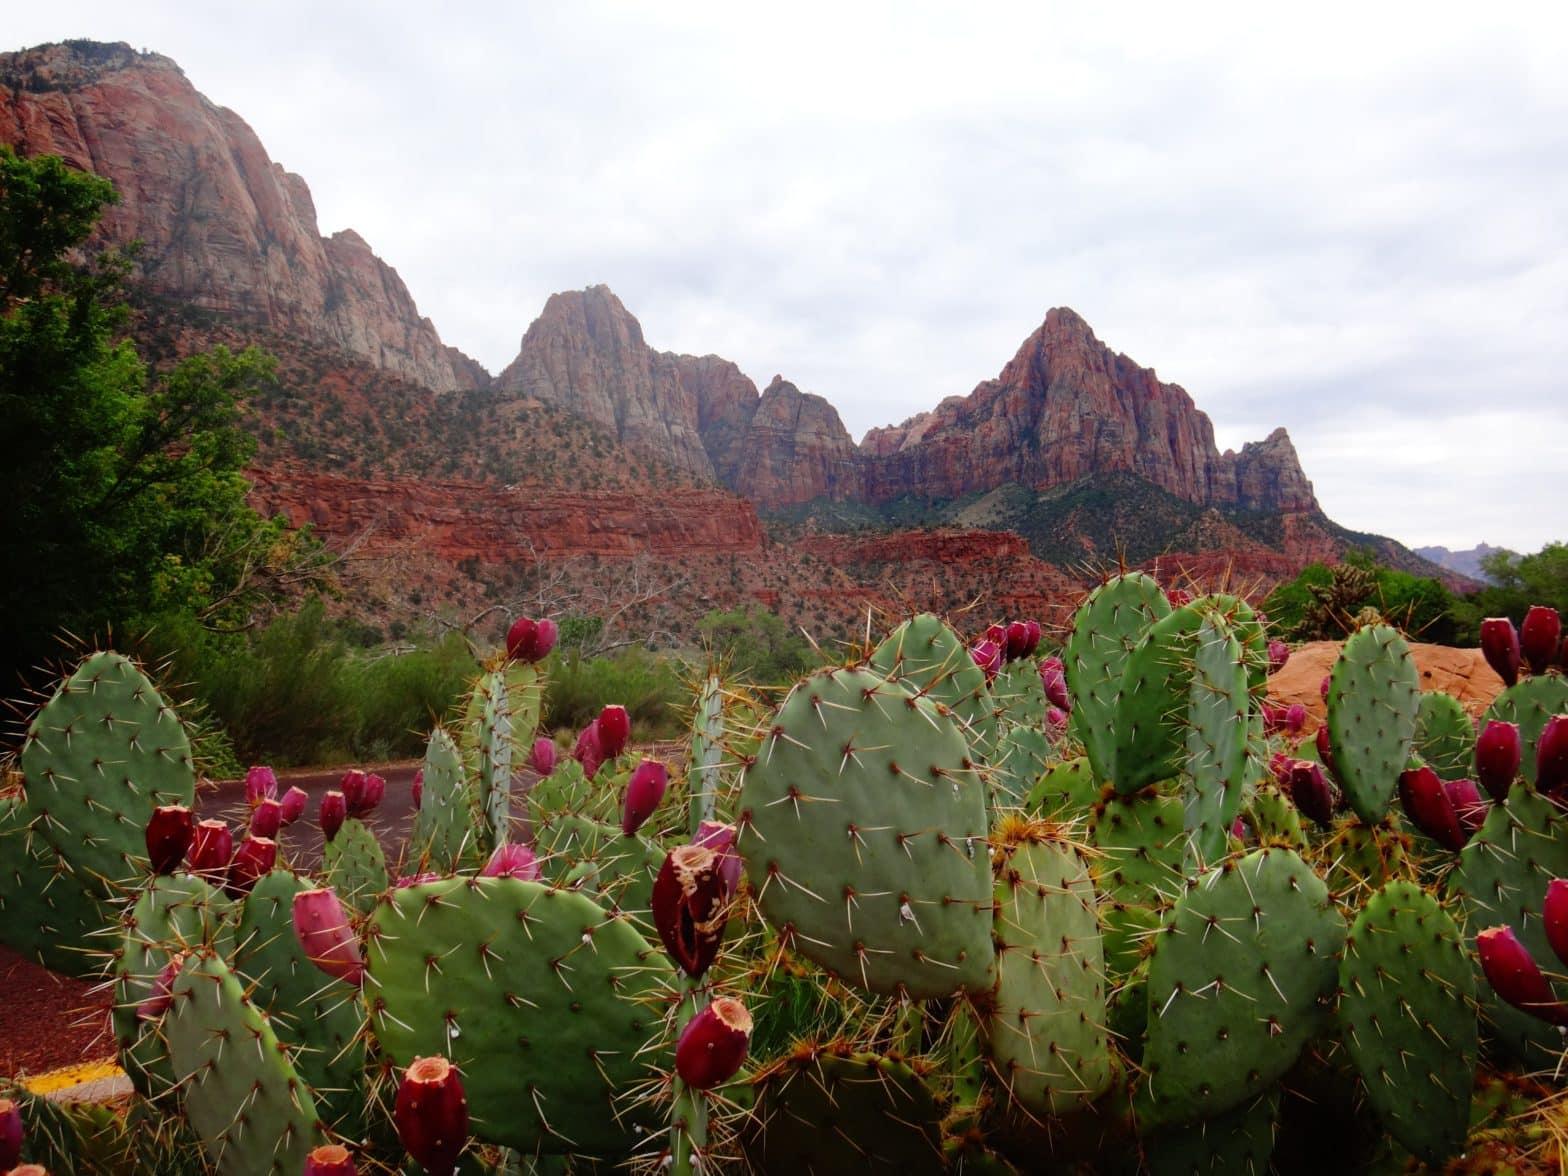 Chamos de cactus au Mexique